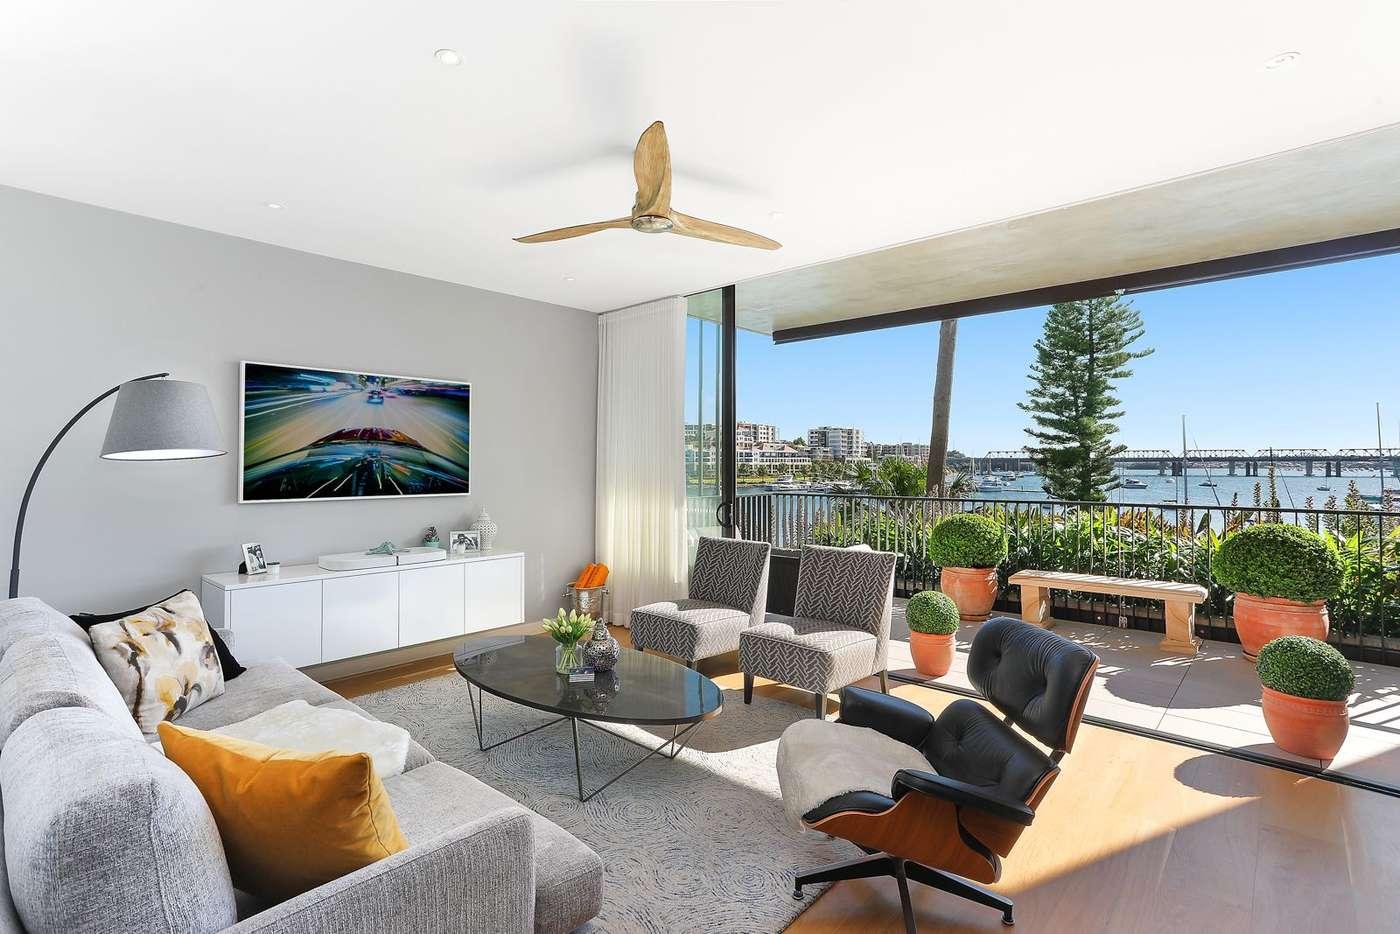 Main view of Homely apartment listing, 2G/106 Elliott Street, Balmain, NSW 2041